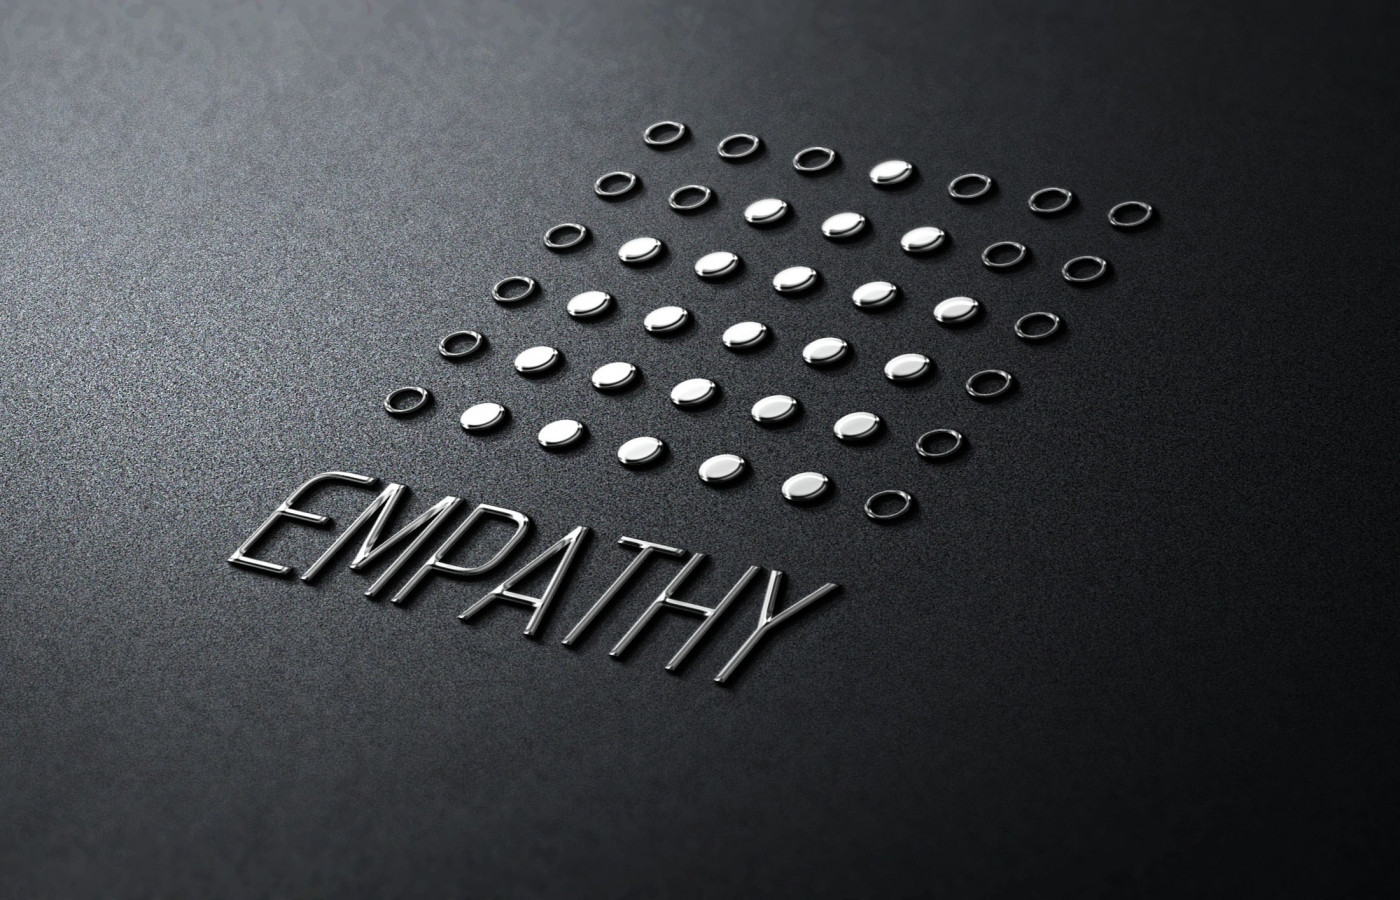 Empathy logotipas. https://lt-lt.facebook.com/MetalArtStudio.LT